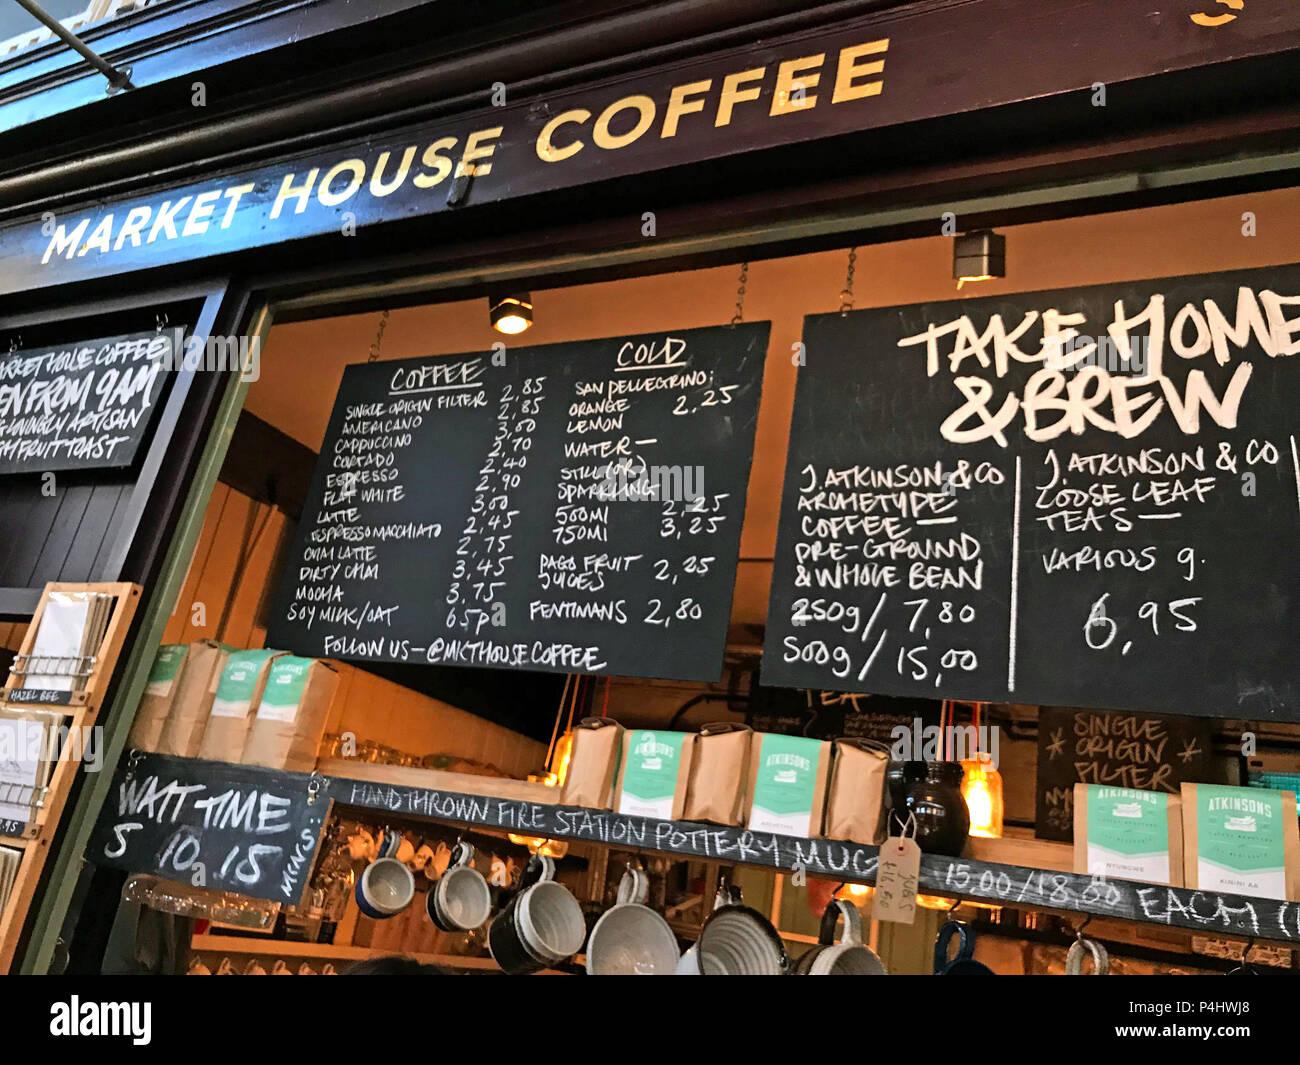 Market House Coffee stall, Altrincham market,hall, Market Street, Altrincham, Trafford, Greater Manchester, North West England, Stock Photo